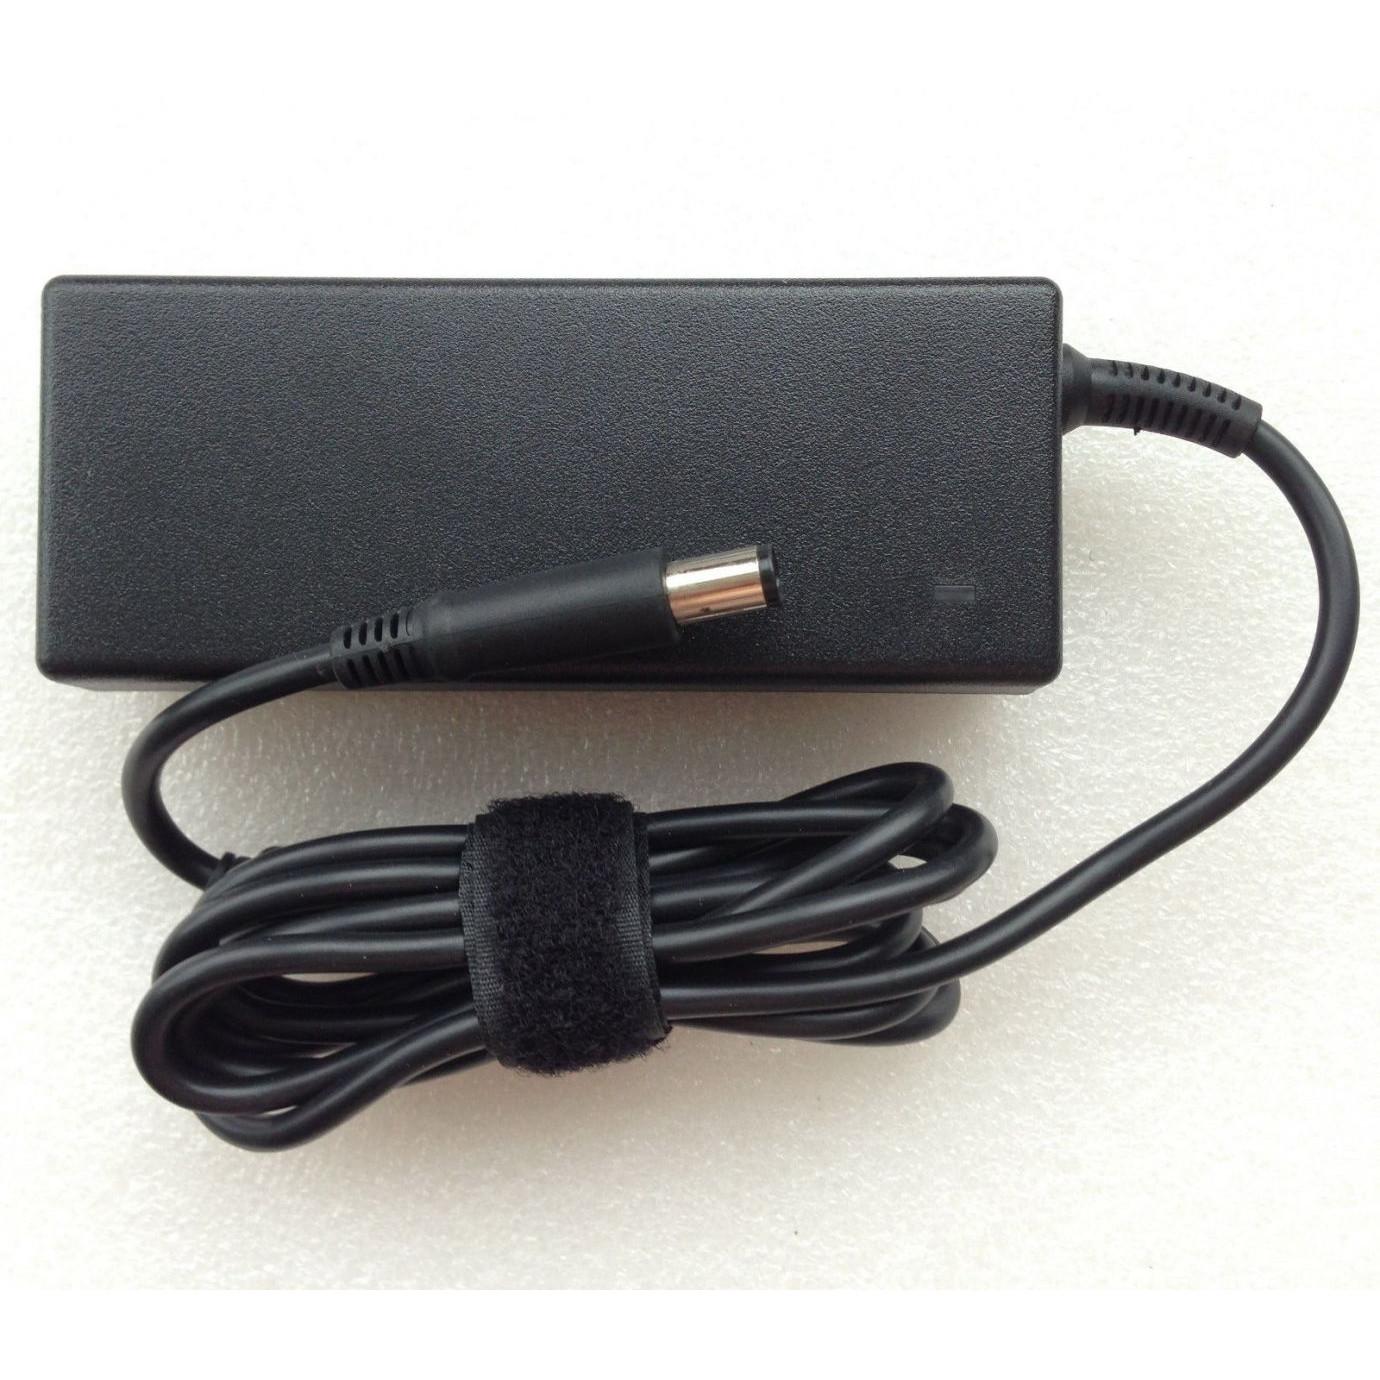 Sạc cho laptop Dell Latitude E5440, E5250, E5404, E5400, E5450, 5480, E5420, E5470, E5530